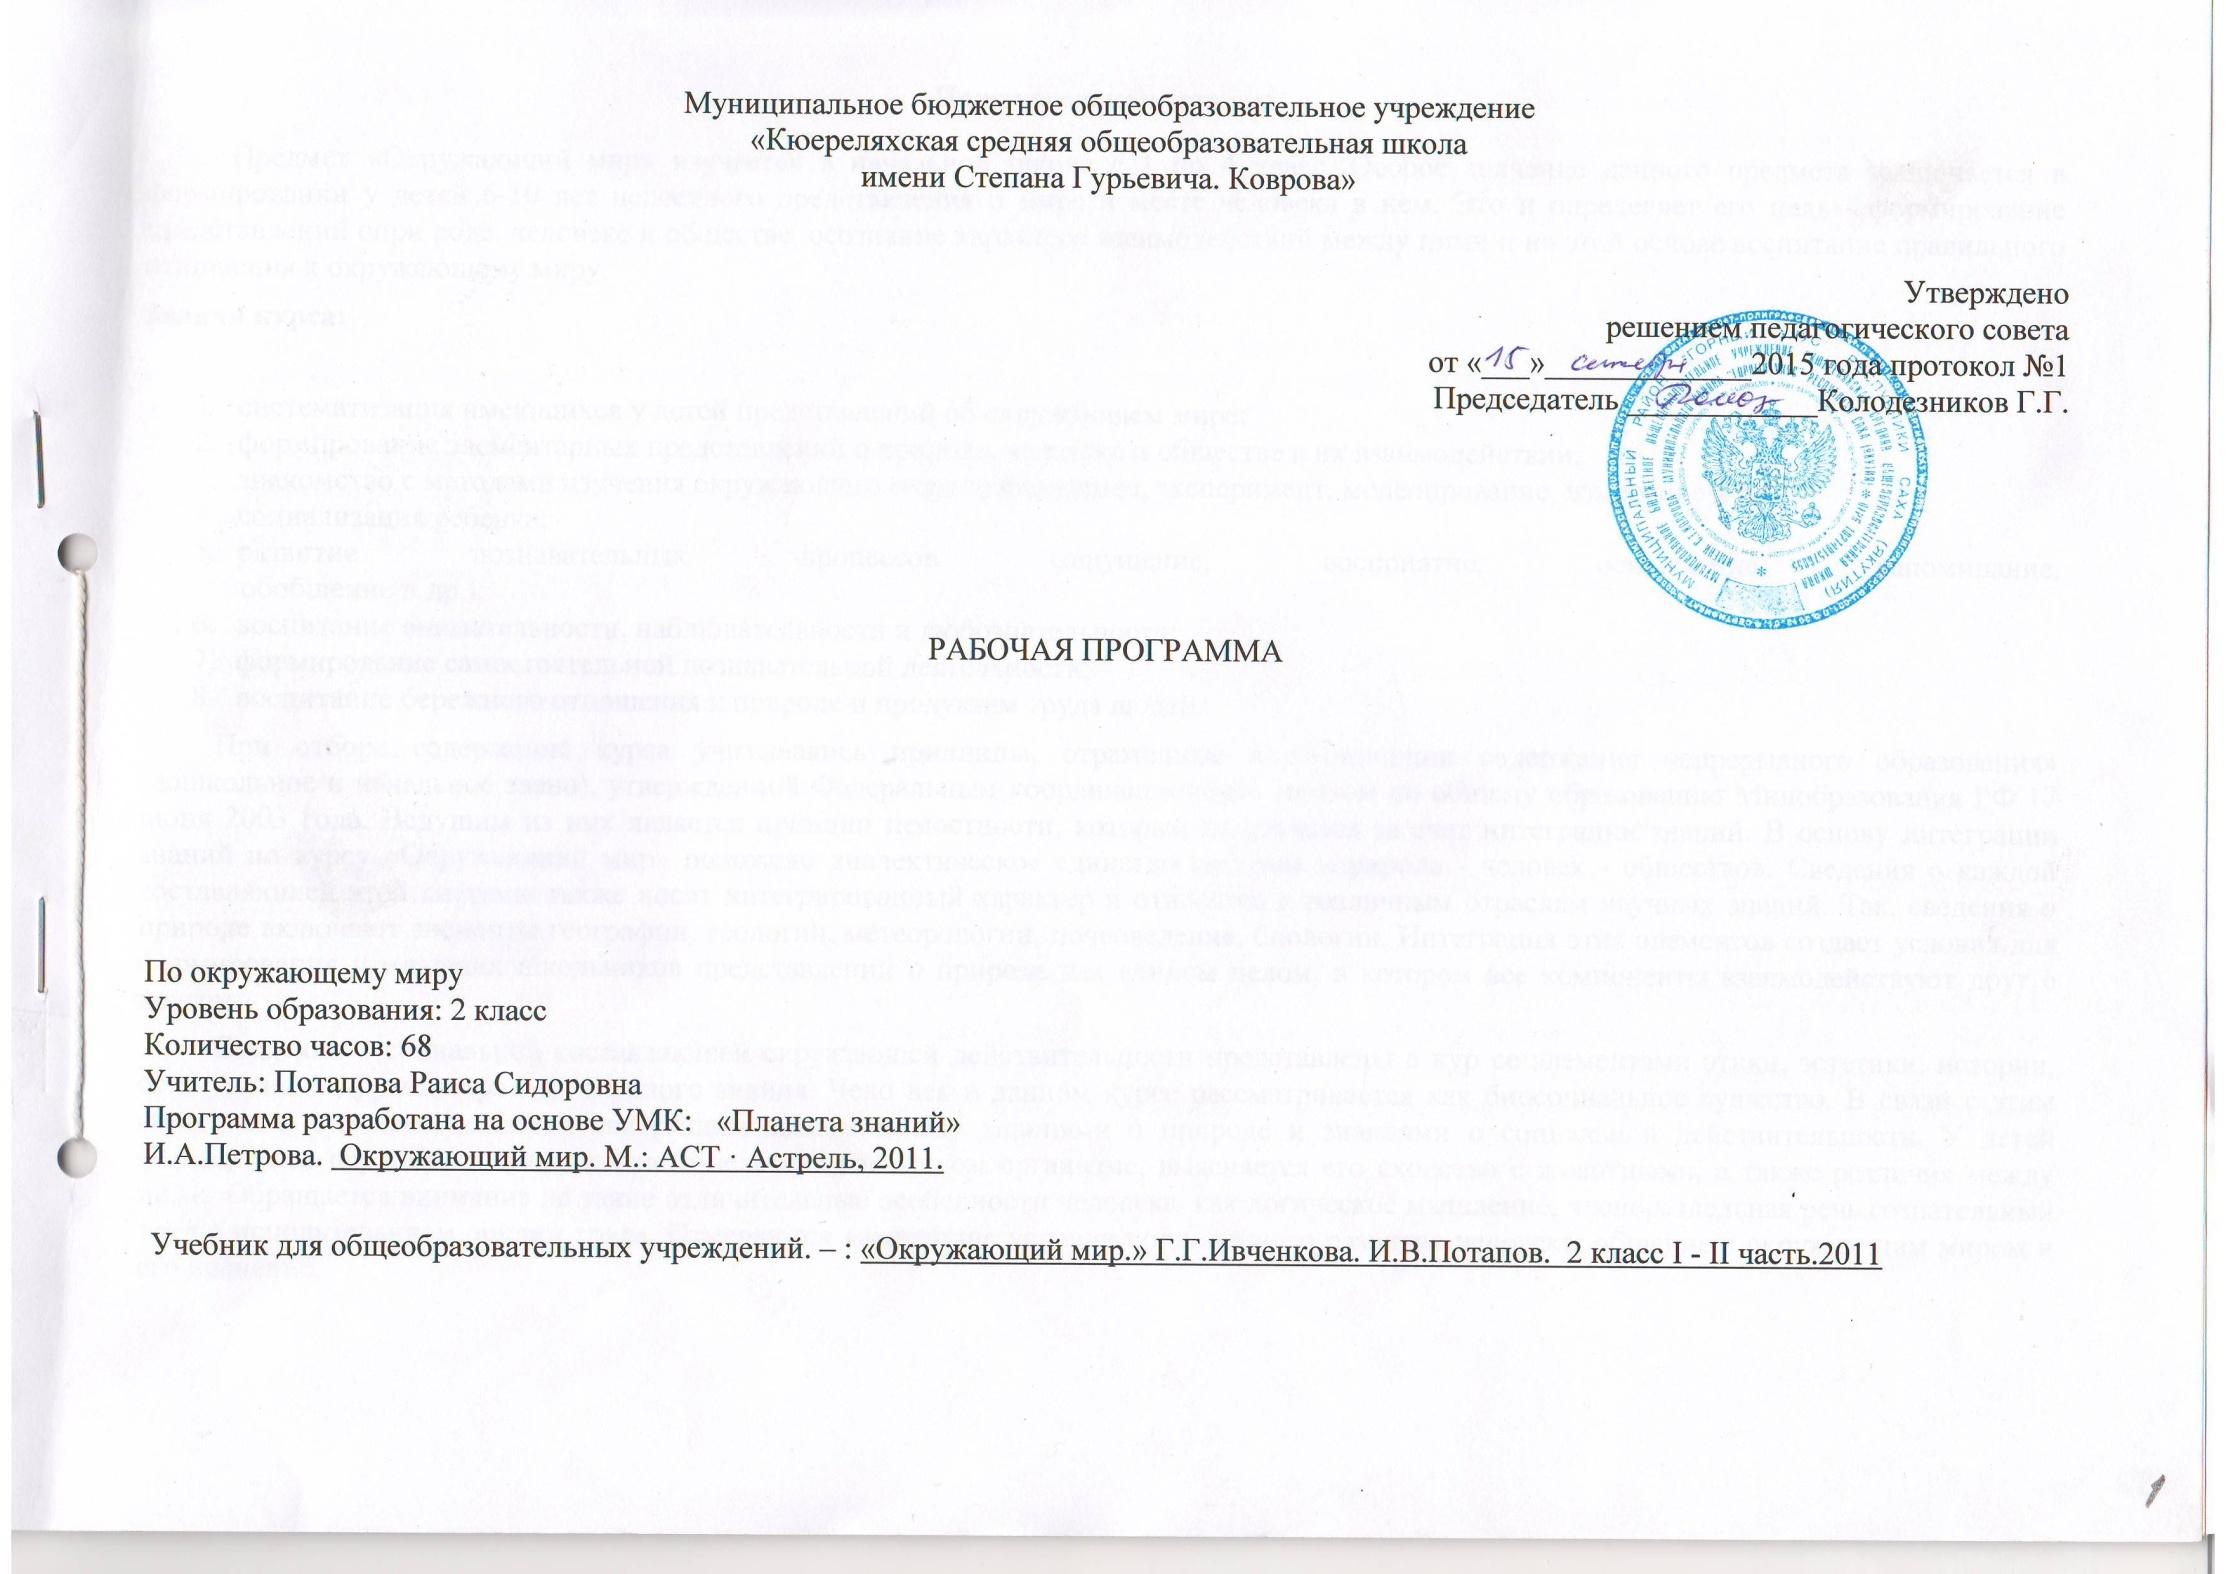 E:\Раиса Сидоровна\2015-2016\1.JPG